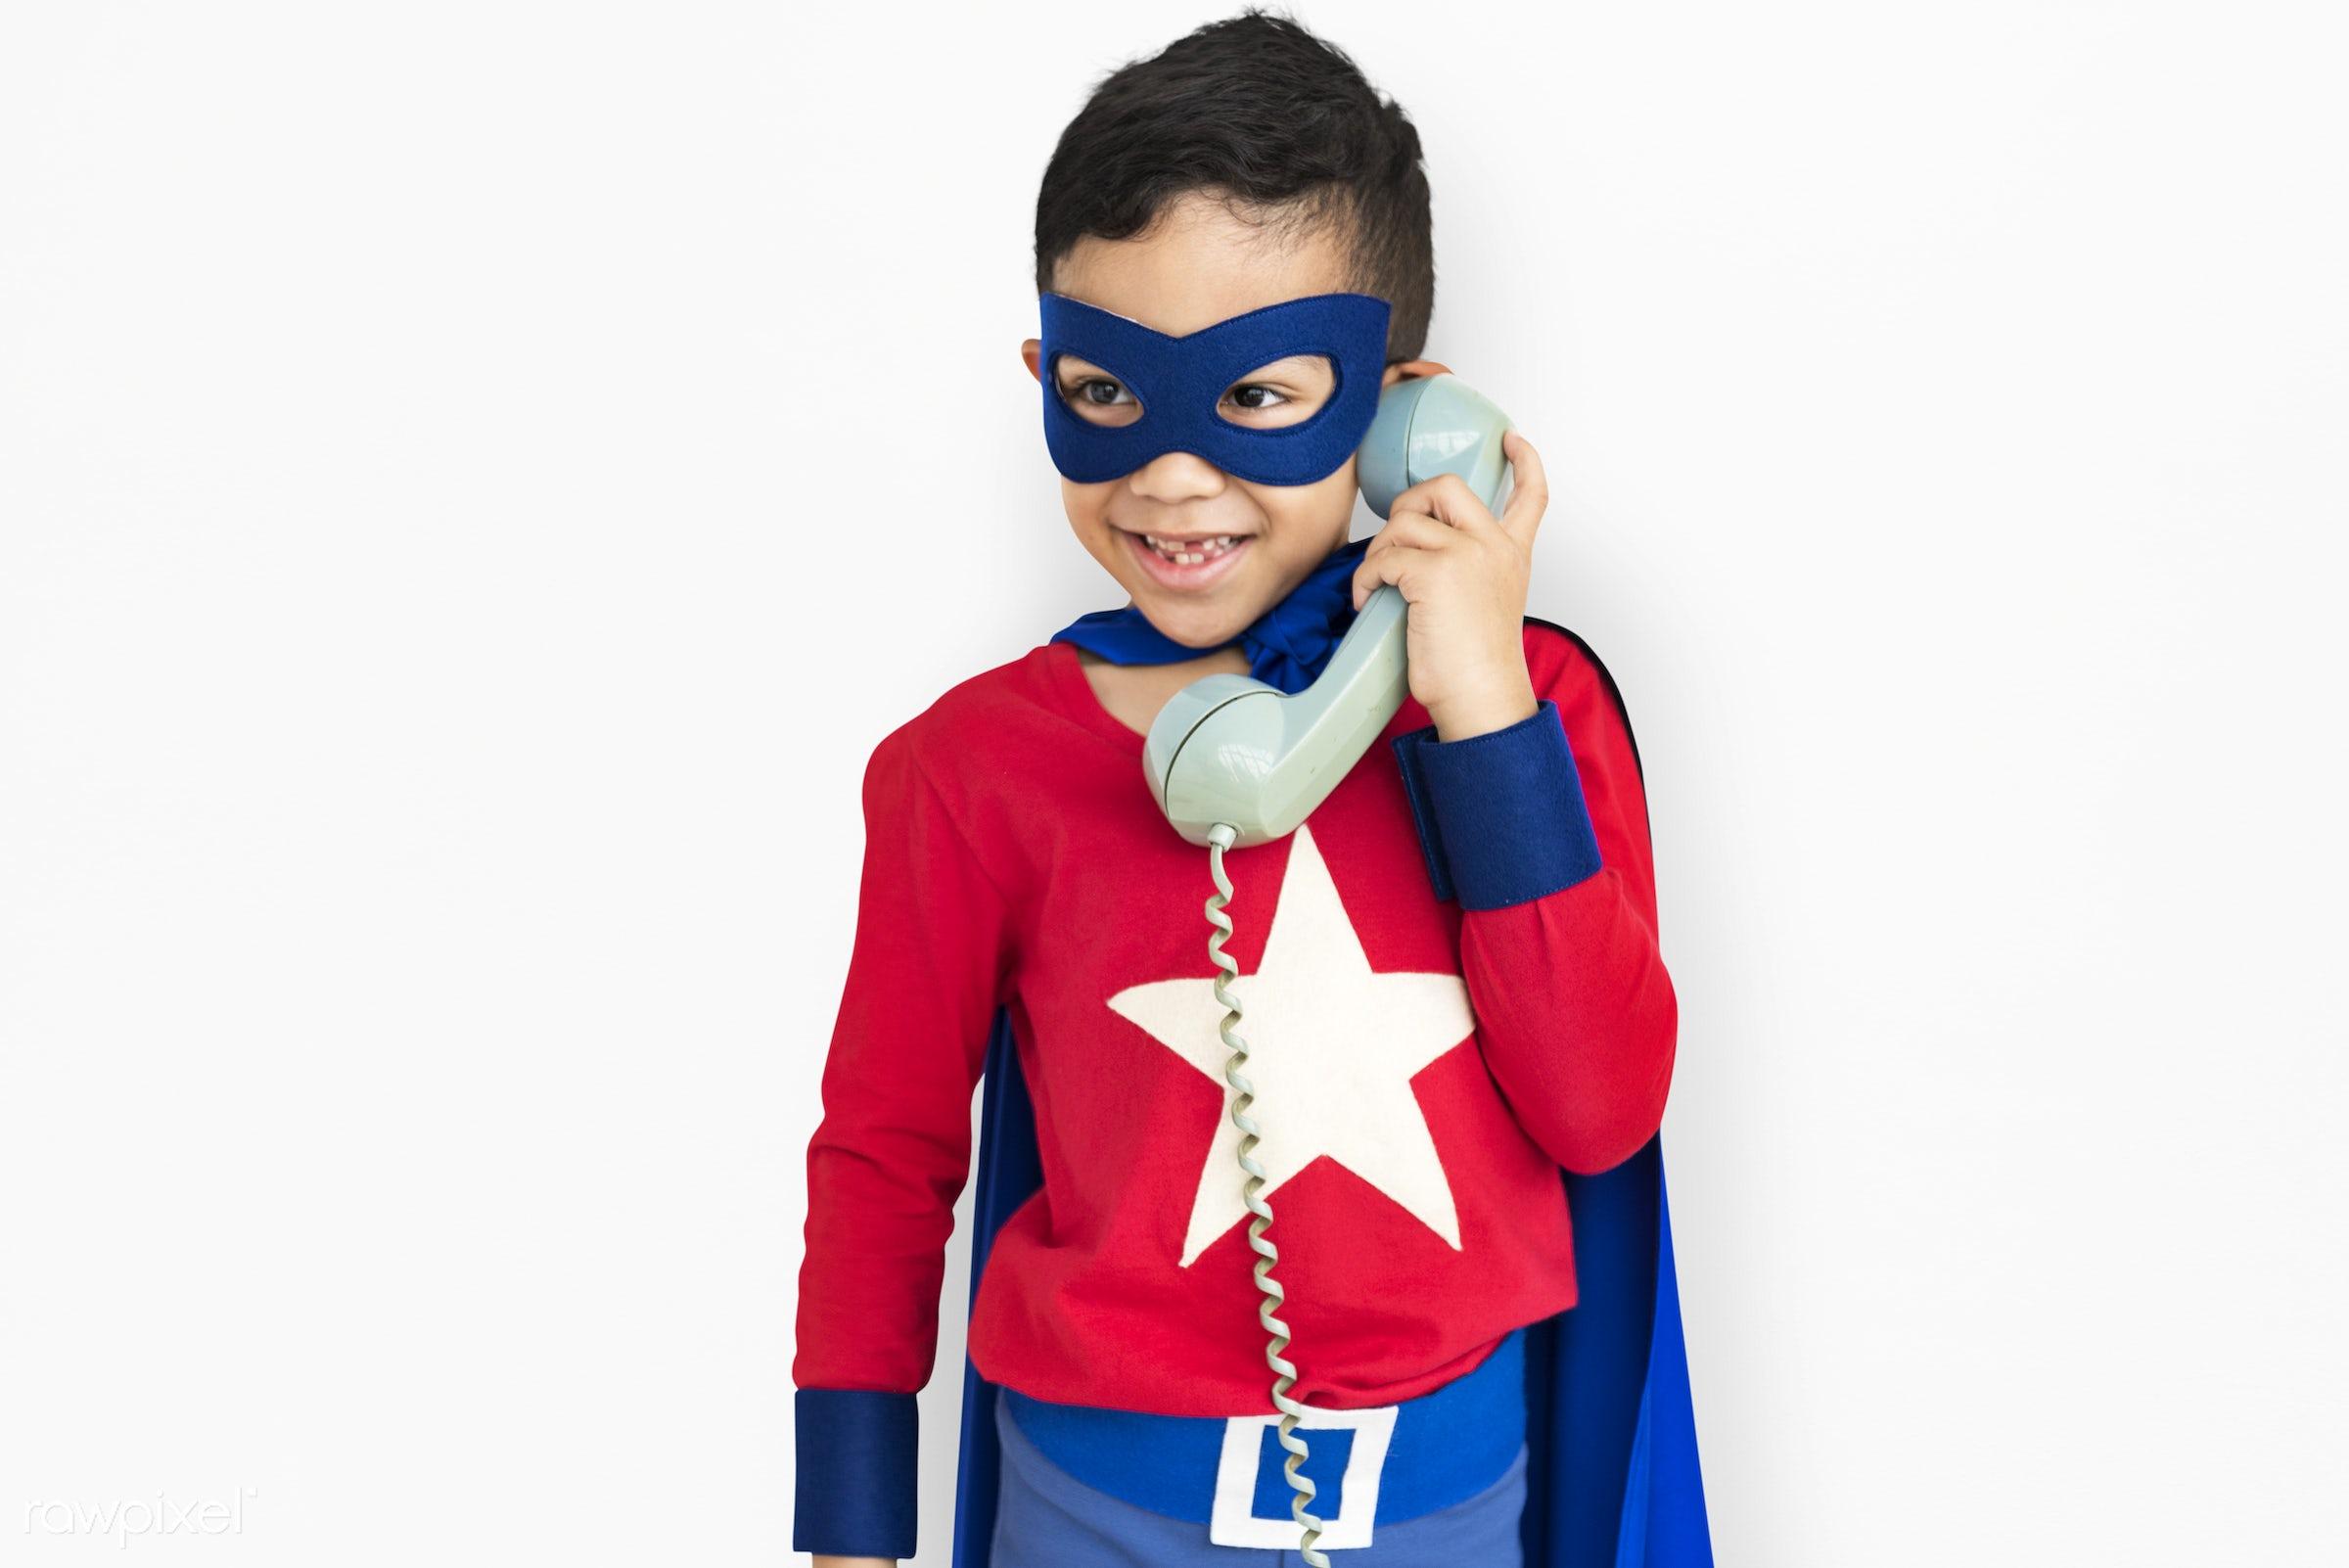 children, courageous, adolescence, kid, child, inspiration, telecommunication, leader, idol, childhood, superhero, isolated...